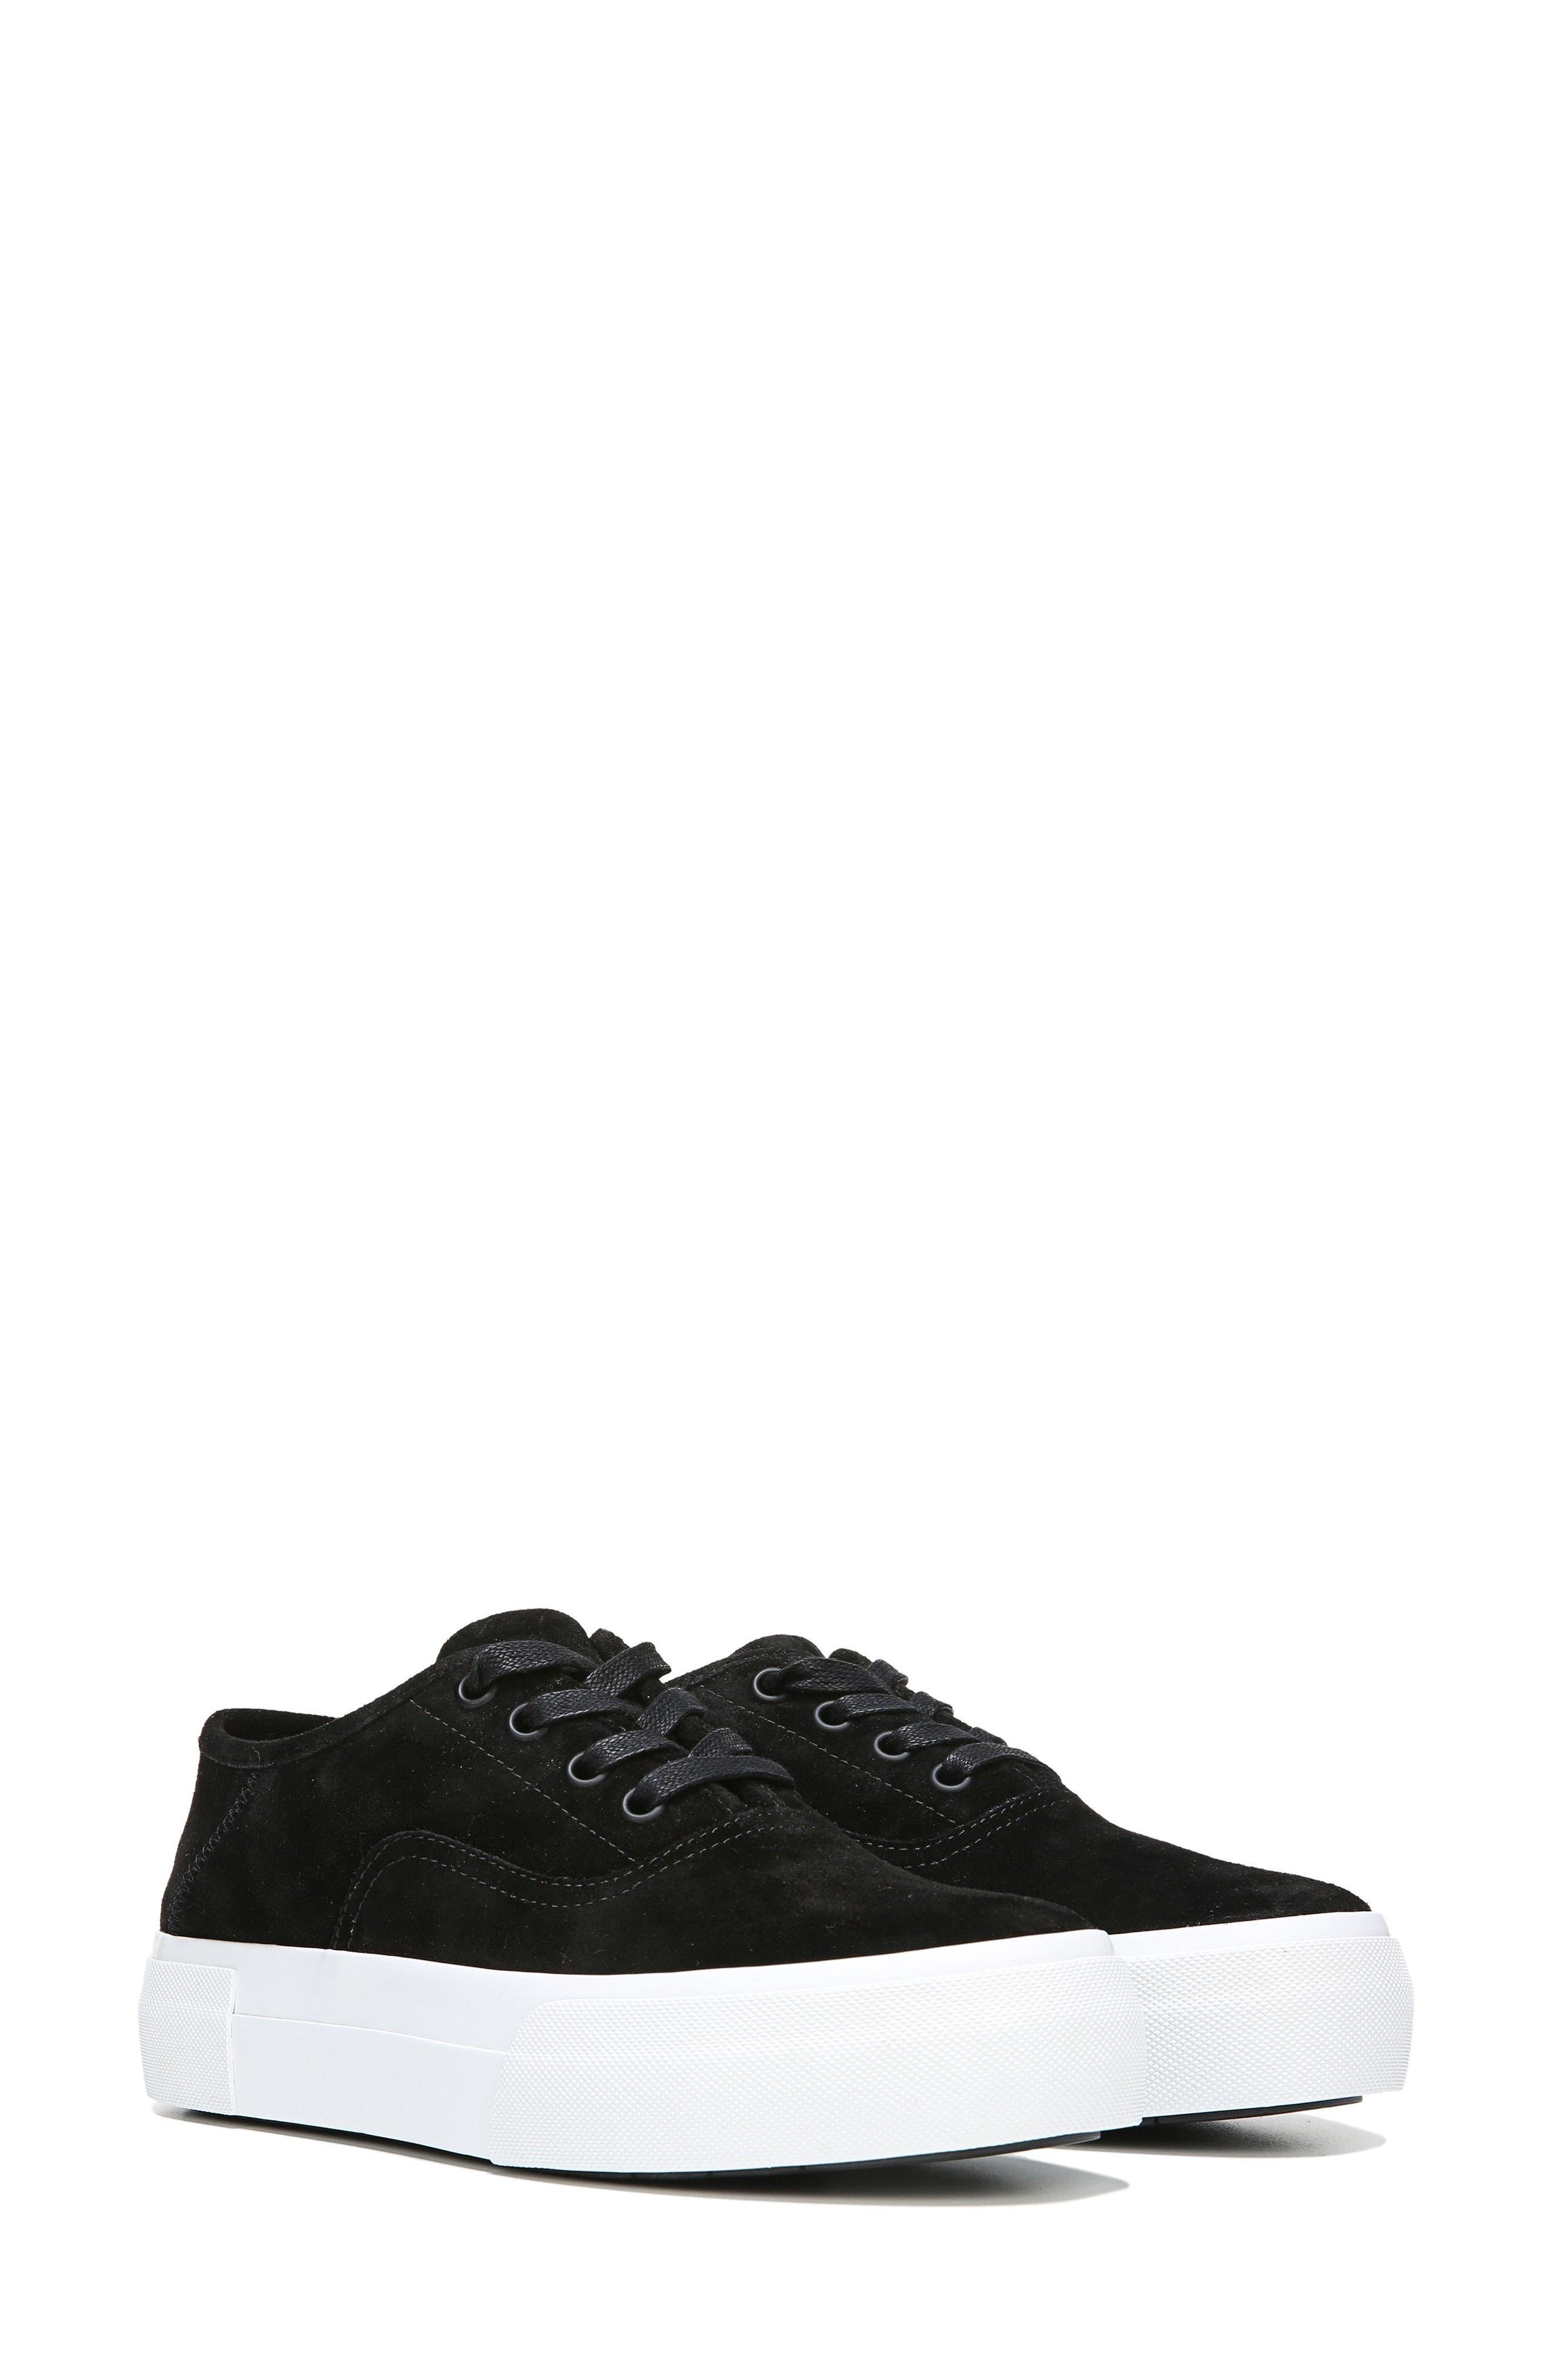 Copley Platform Sneaker,                             Alternate thumbnail 9, color,                             001